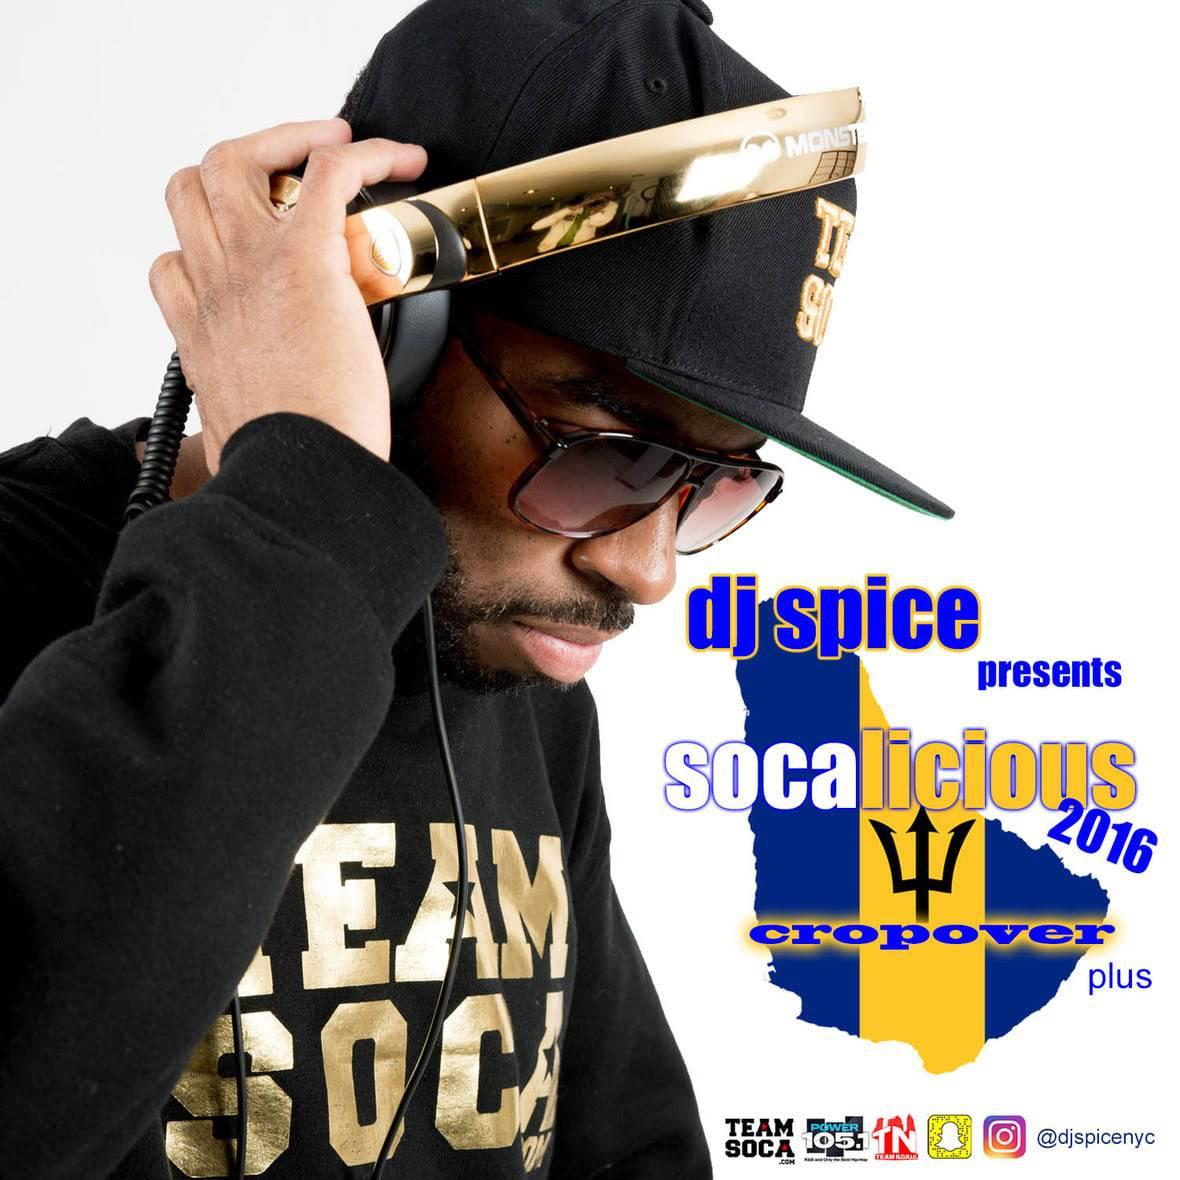 Dj Spice - Socalicious 2016 - Crop Over Plus Soca Mix